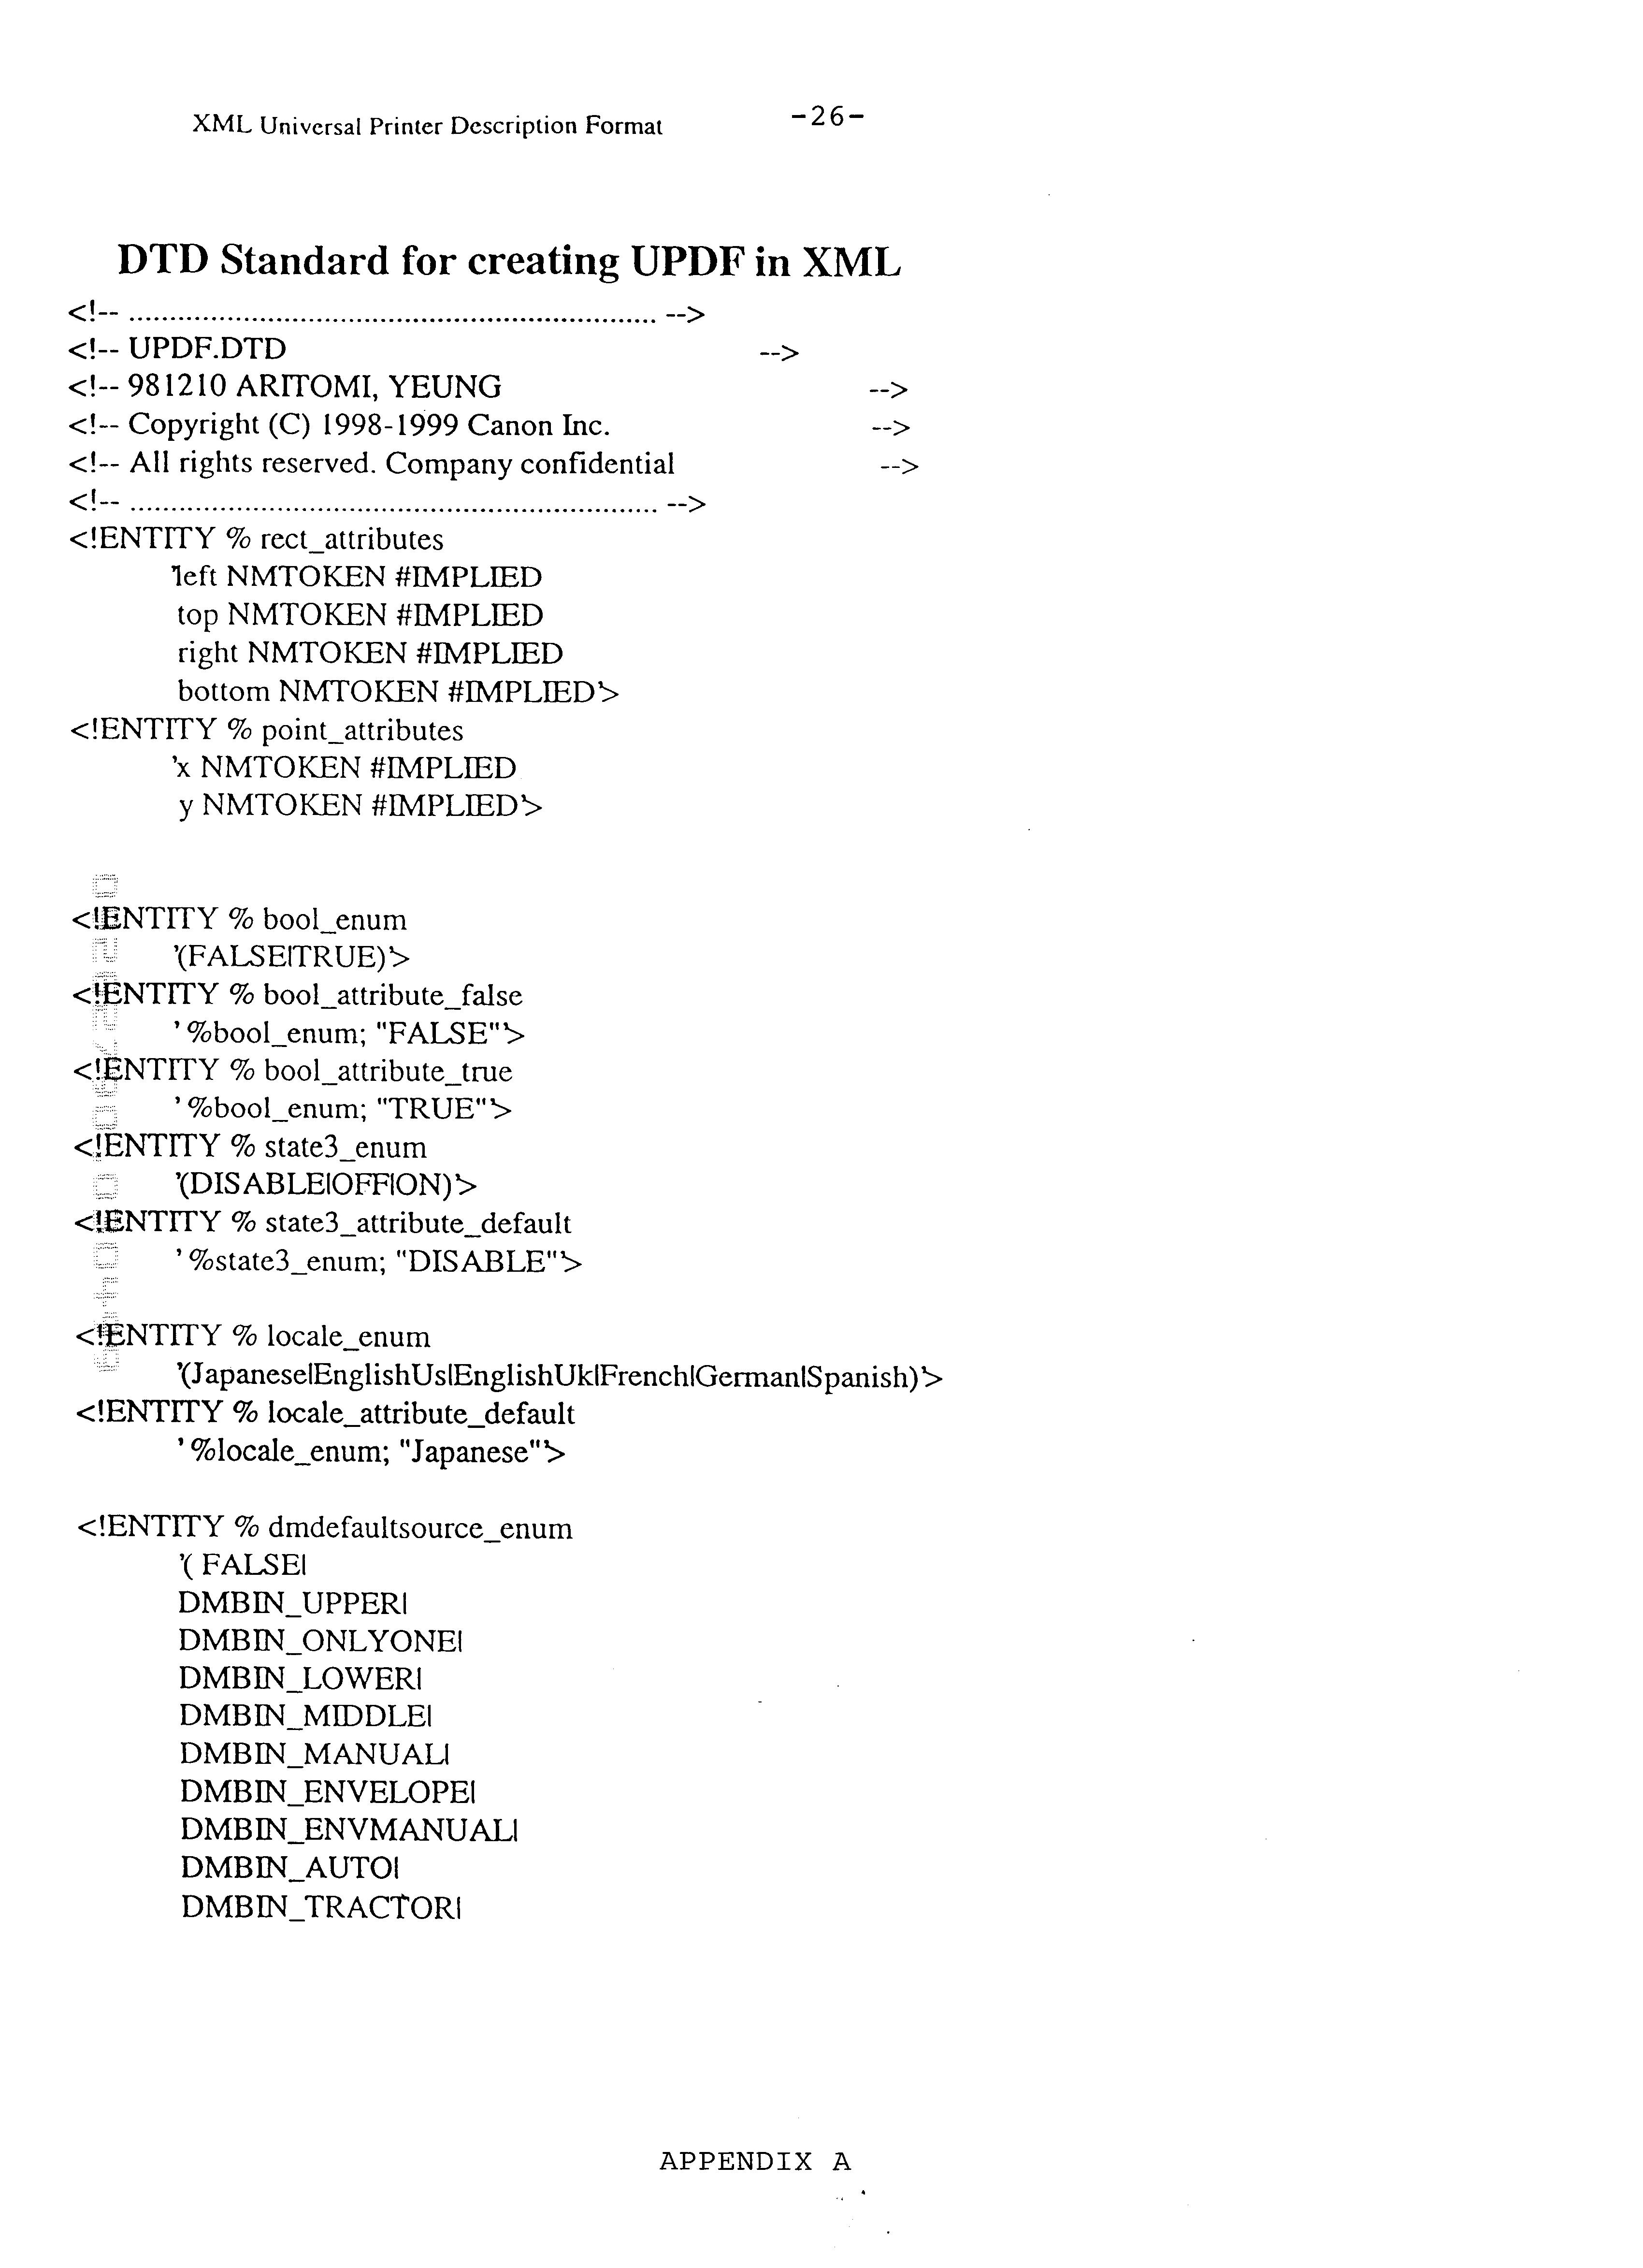 US6426798B1 - Data structure for printer description file - Google